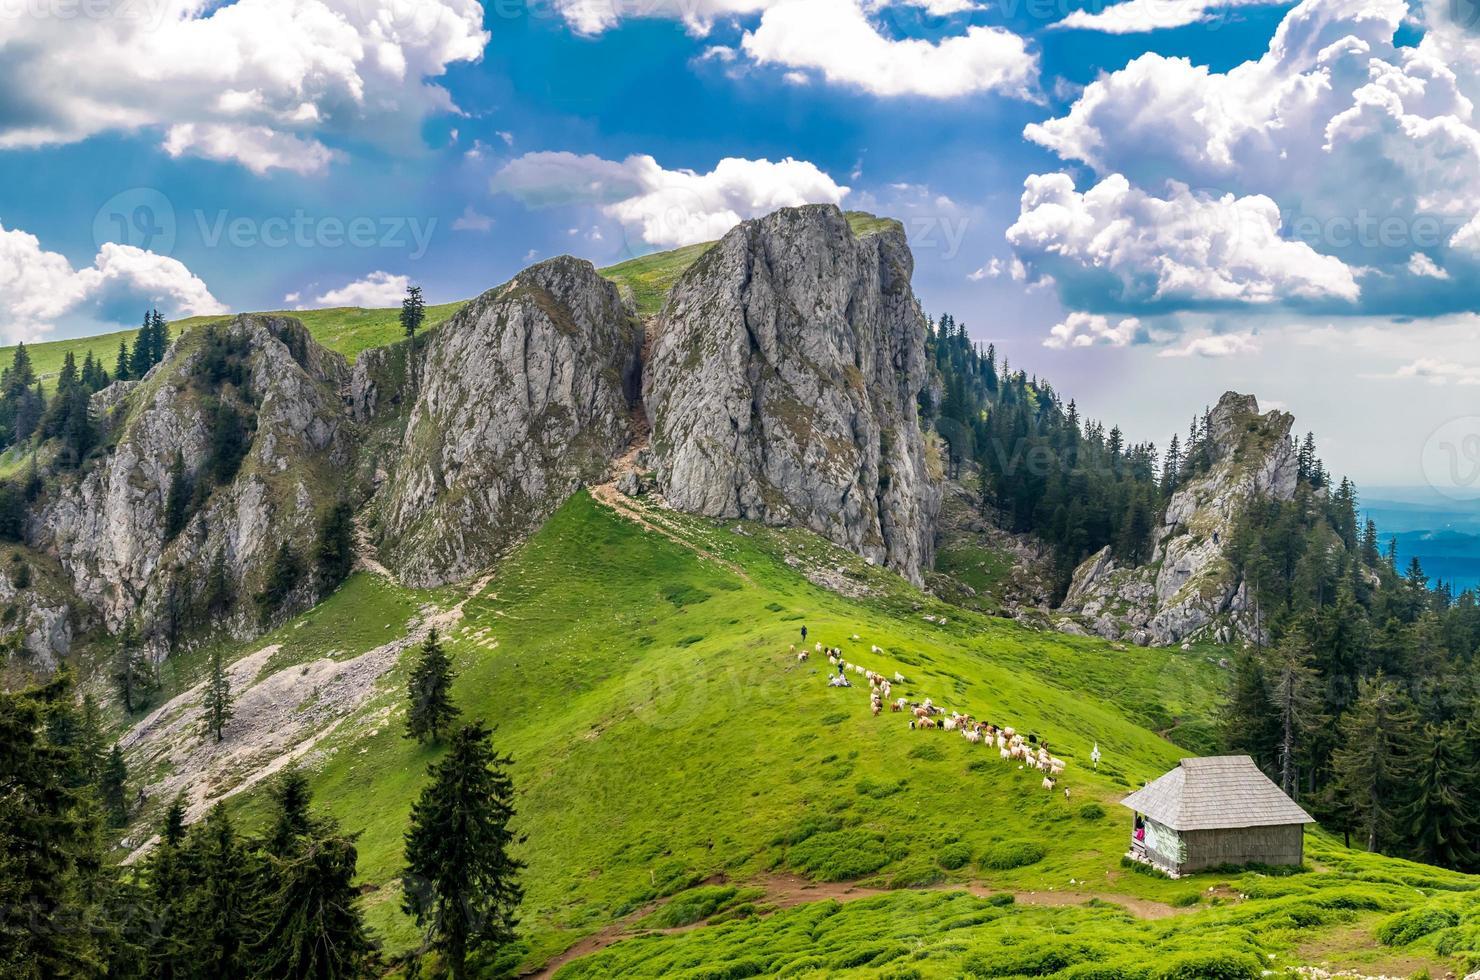 Mountain landscape with sheepfold in Carpathian Mountains, Romania photo